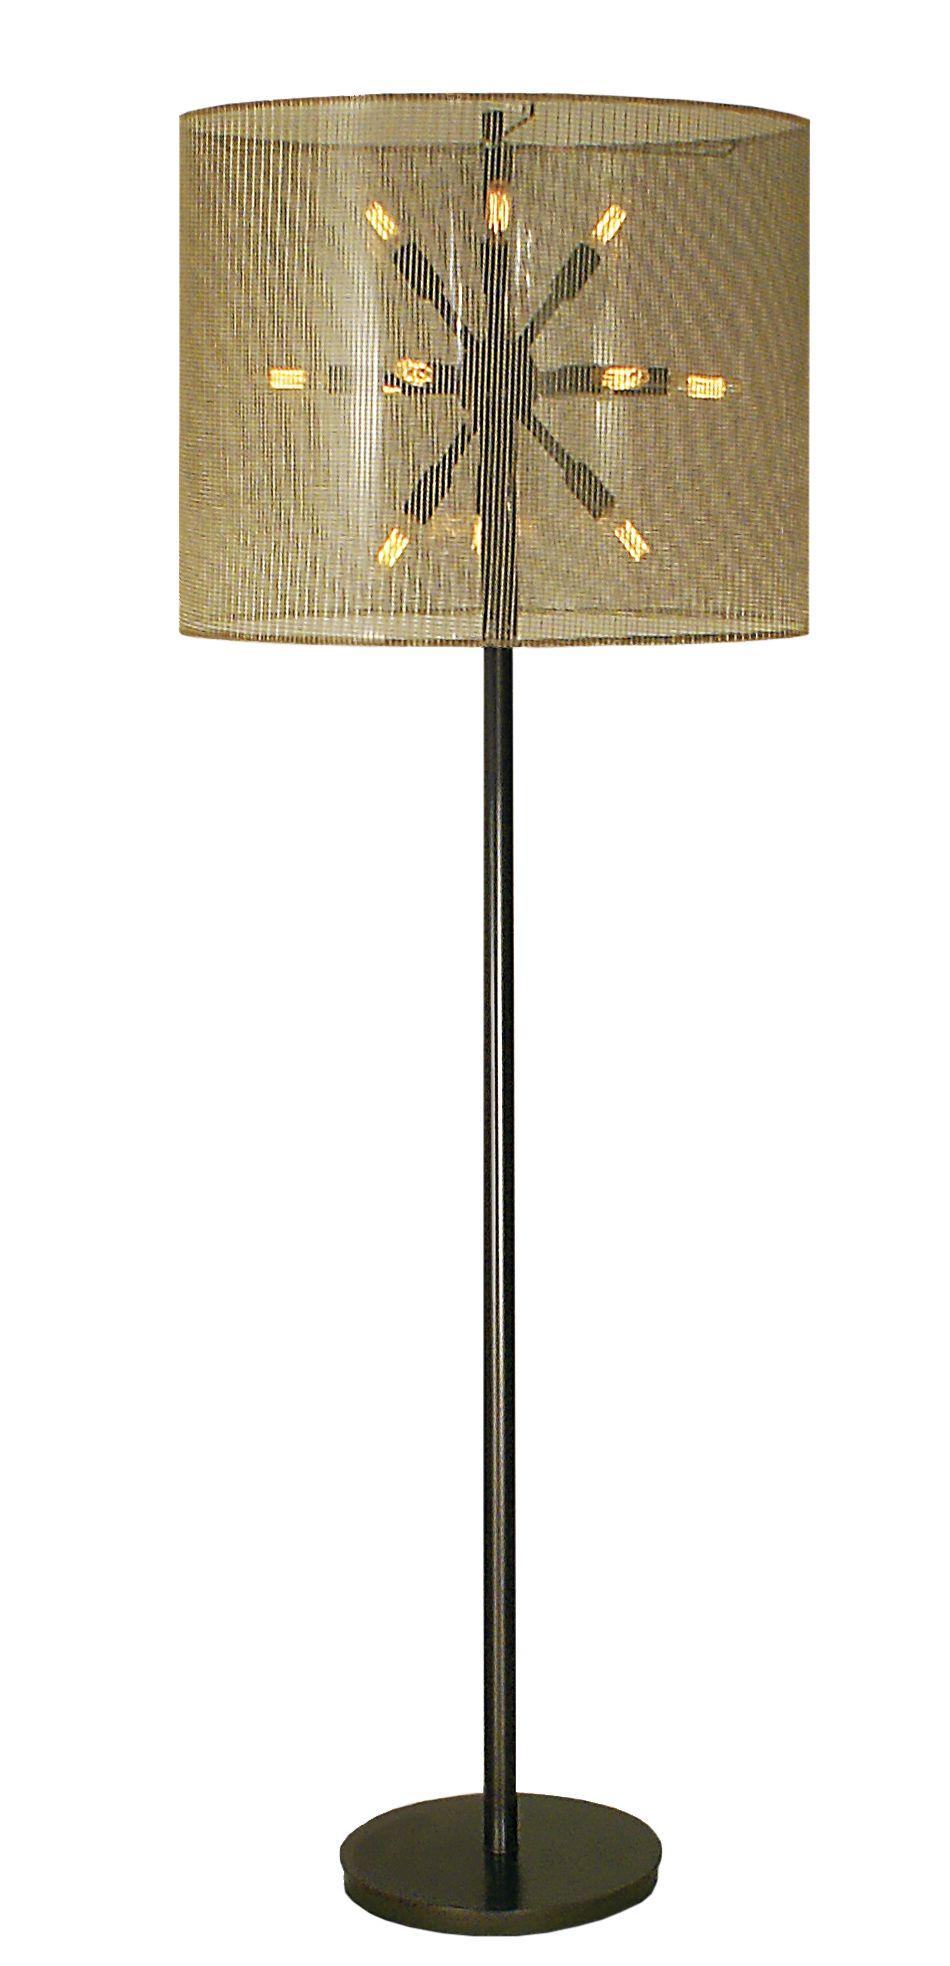 Simone Floor Lamp Made In The Usa Metal Floor Lamp With Mahogany Bronze Finish 12 Arm Cluster Shown With Nostalgic Bulbs En Floor Lamp Lamp Metal Floor Lamps